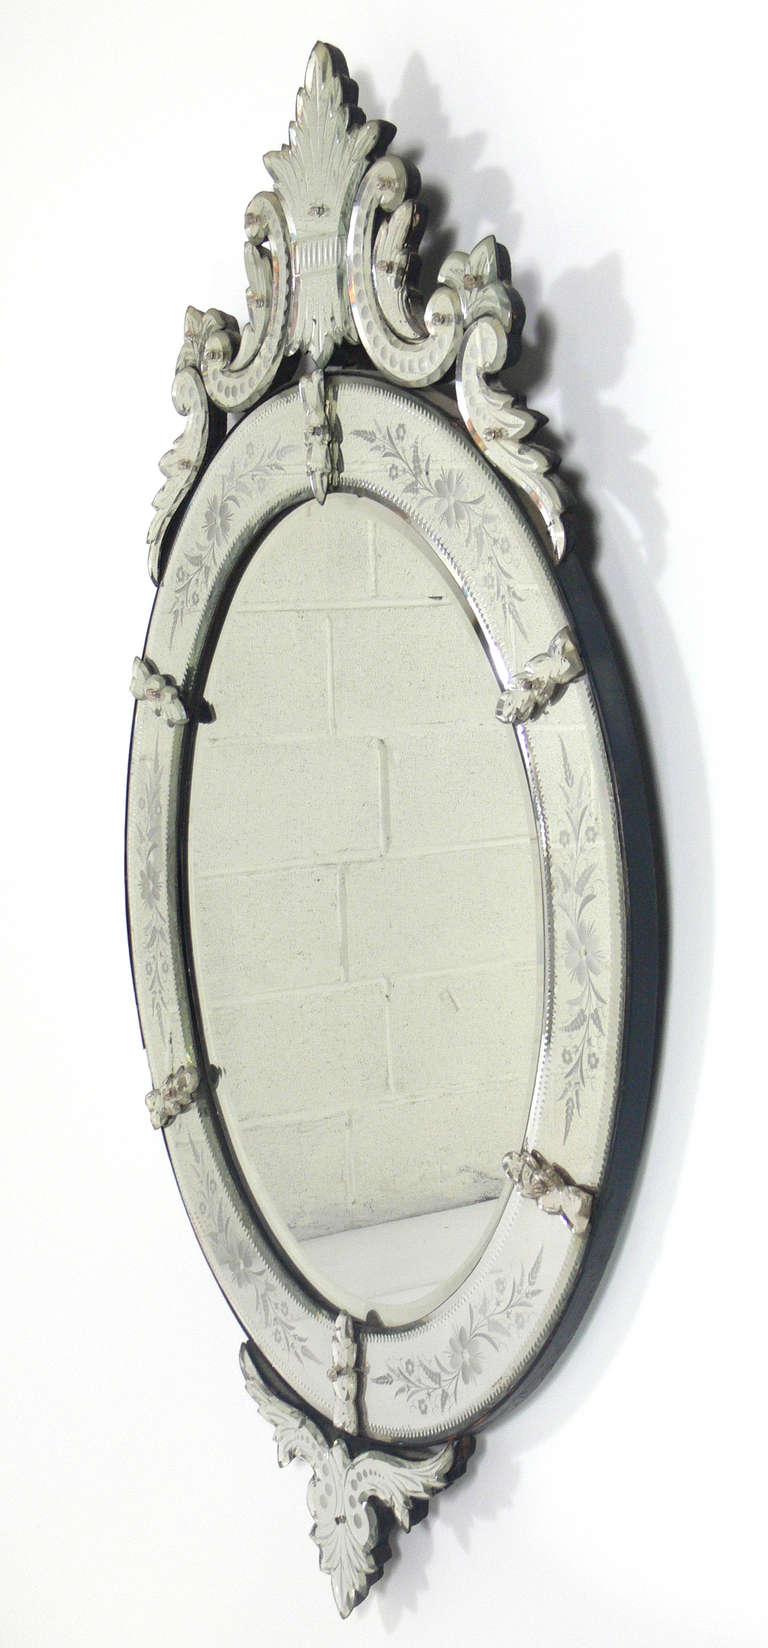 Elegant 19th Century Oval Venetian Mirror, Italy, circa 1890's. Retains wonderful original patina to the mirrored glass.